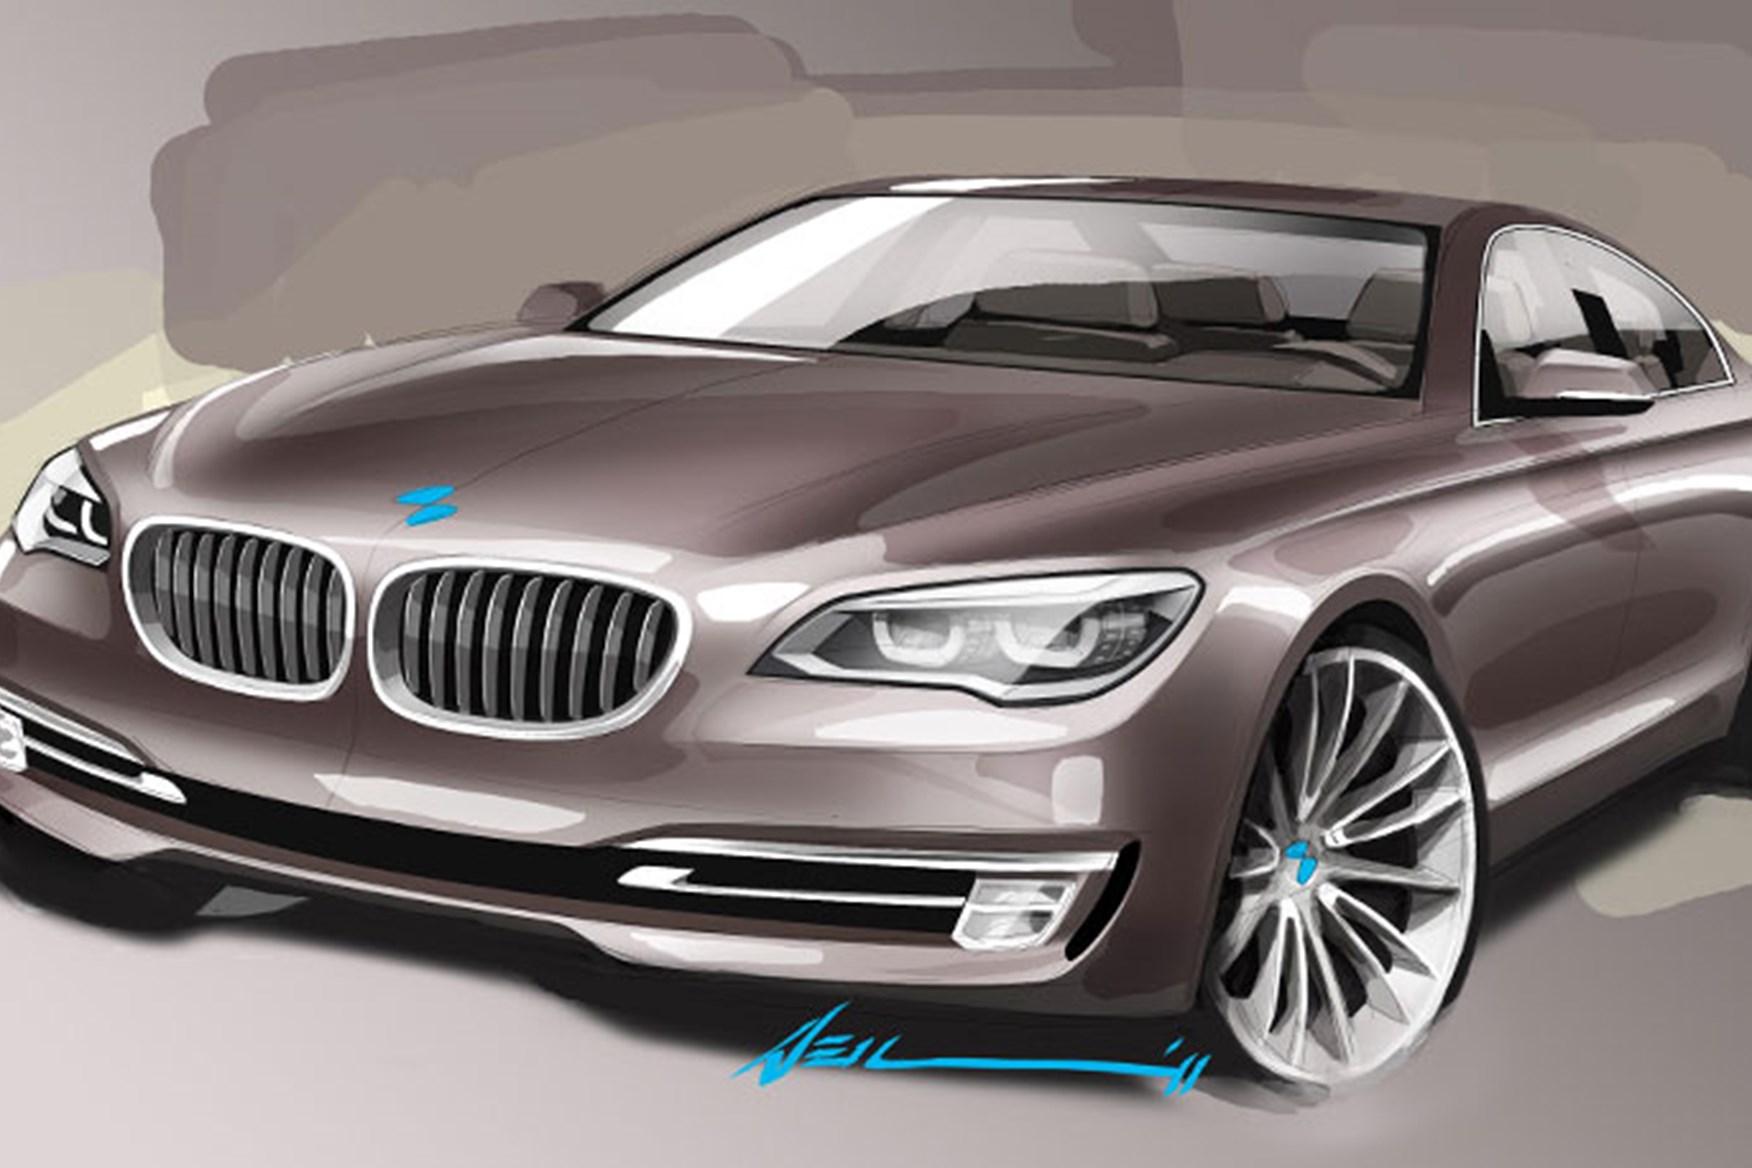 ... BMW 7 Series Design Sketch (NB The Current Model!)